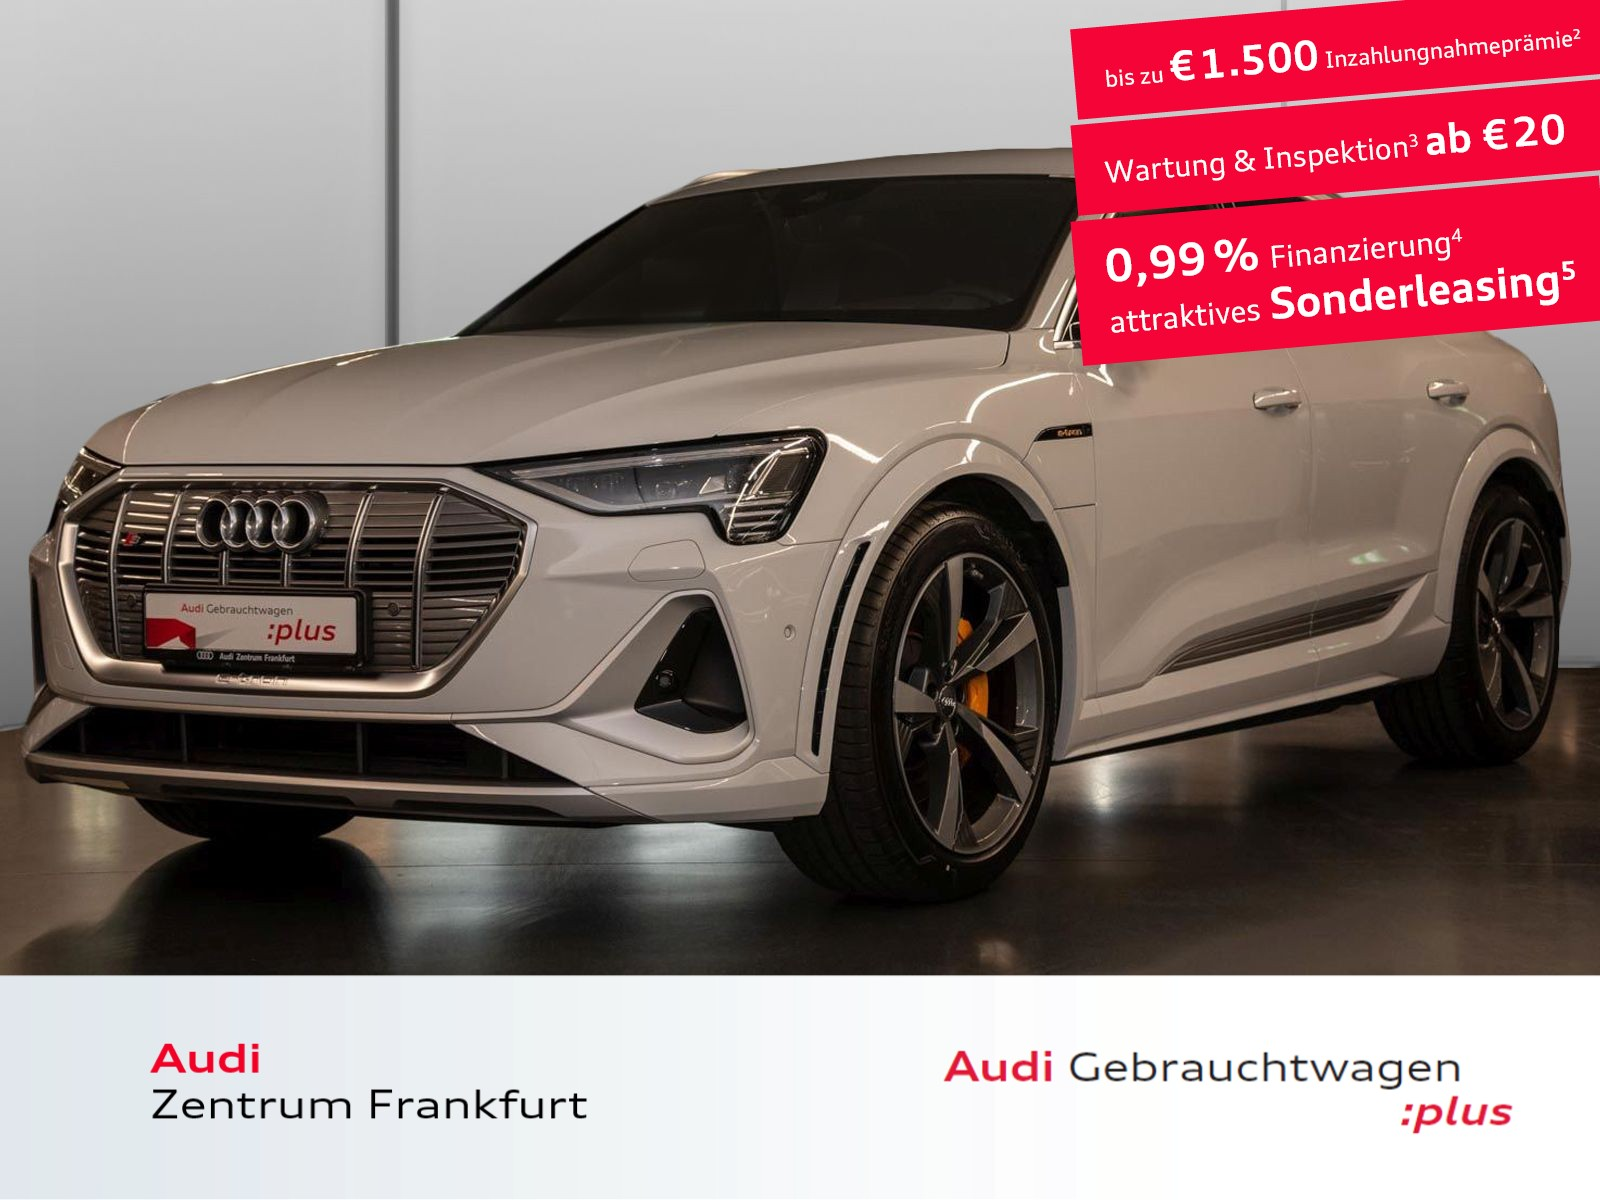 Audi e-tron S Sportback MatrixLED VC AHK DAB B&O Navi, Jahr 2020, Elektro